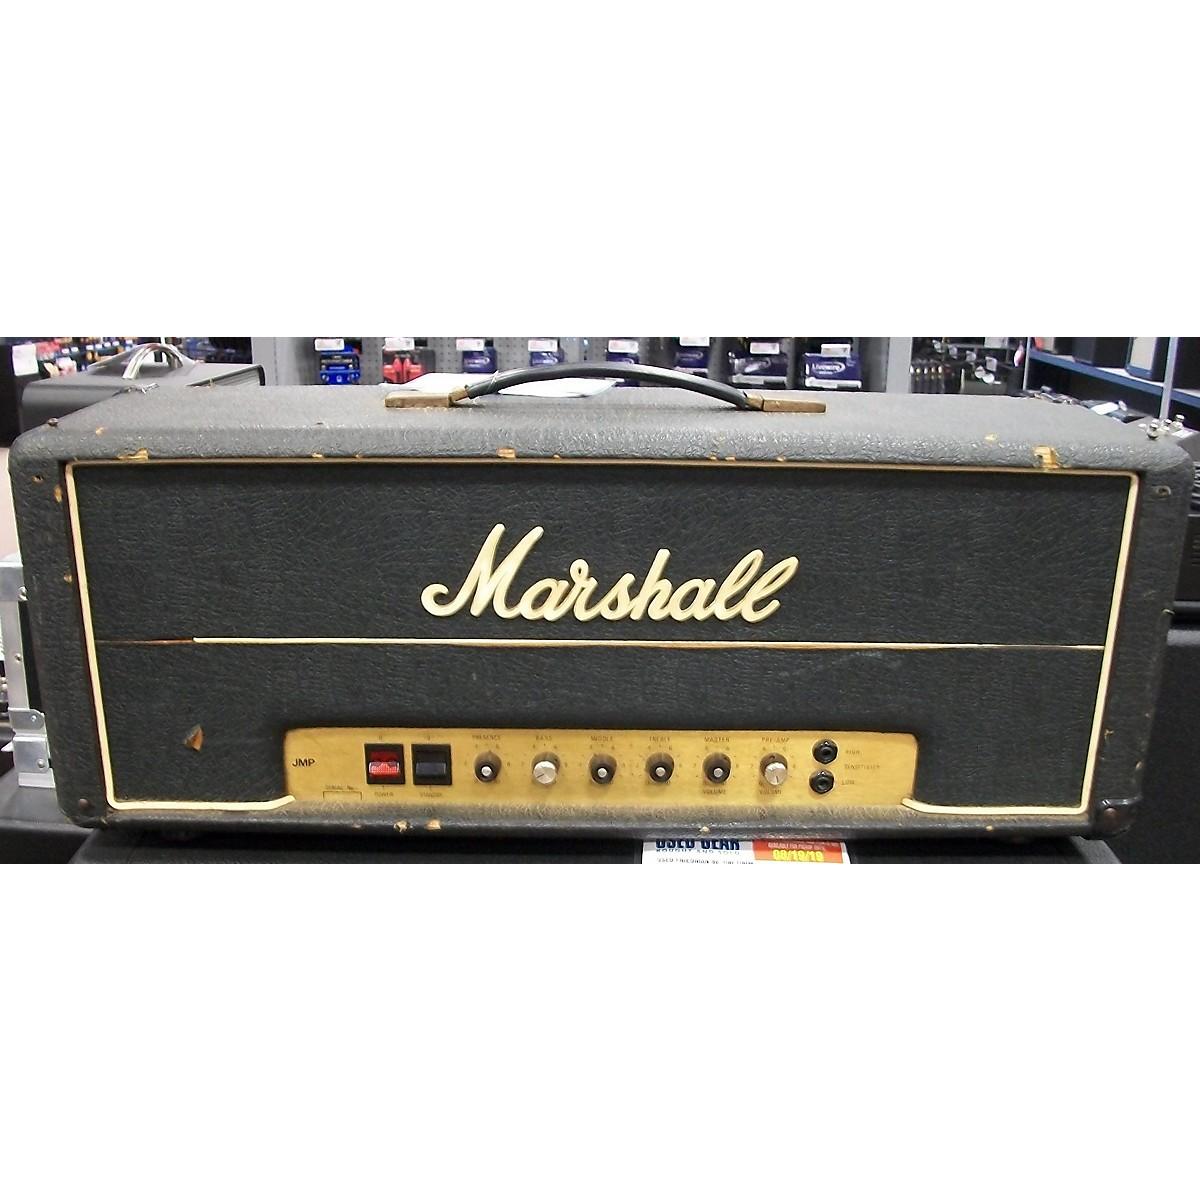 Marshall 1978 50W Master Model Tube Guitar Amp Head